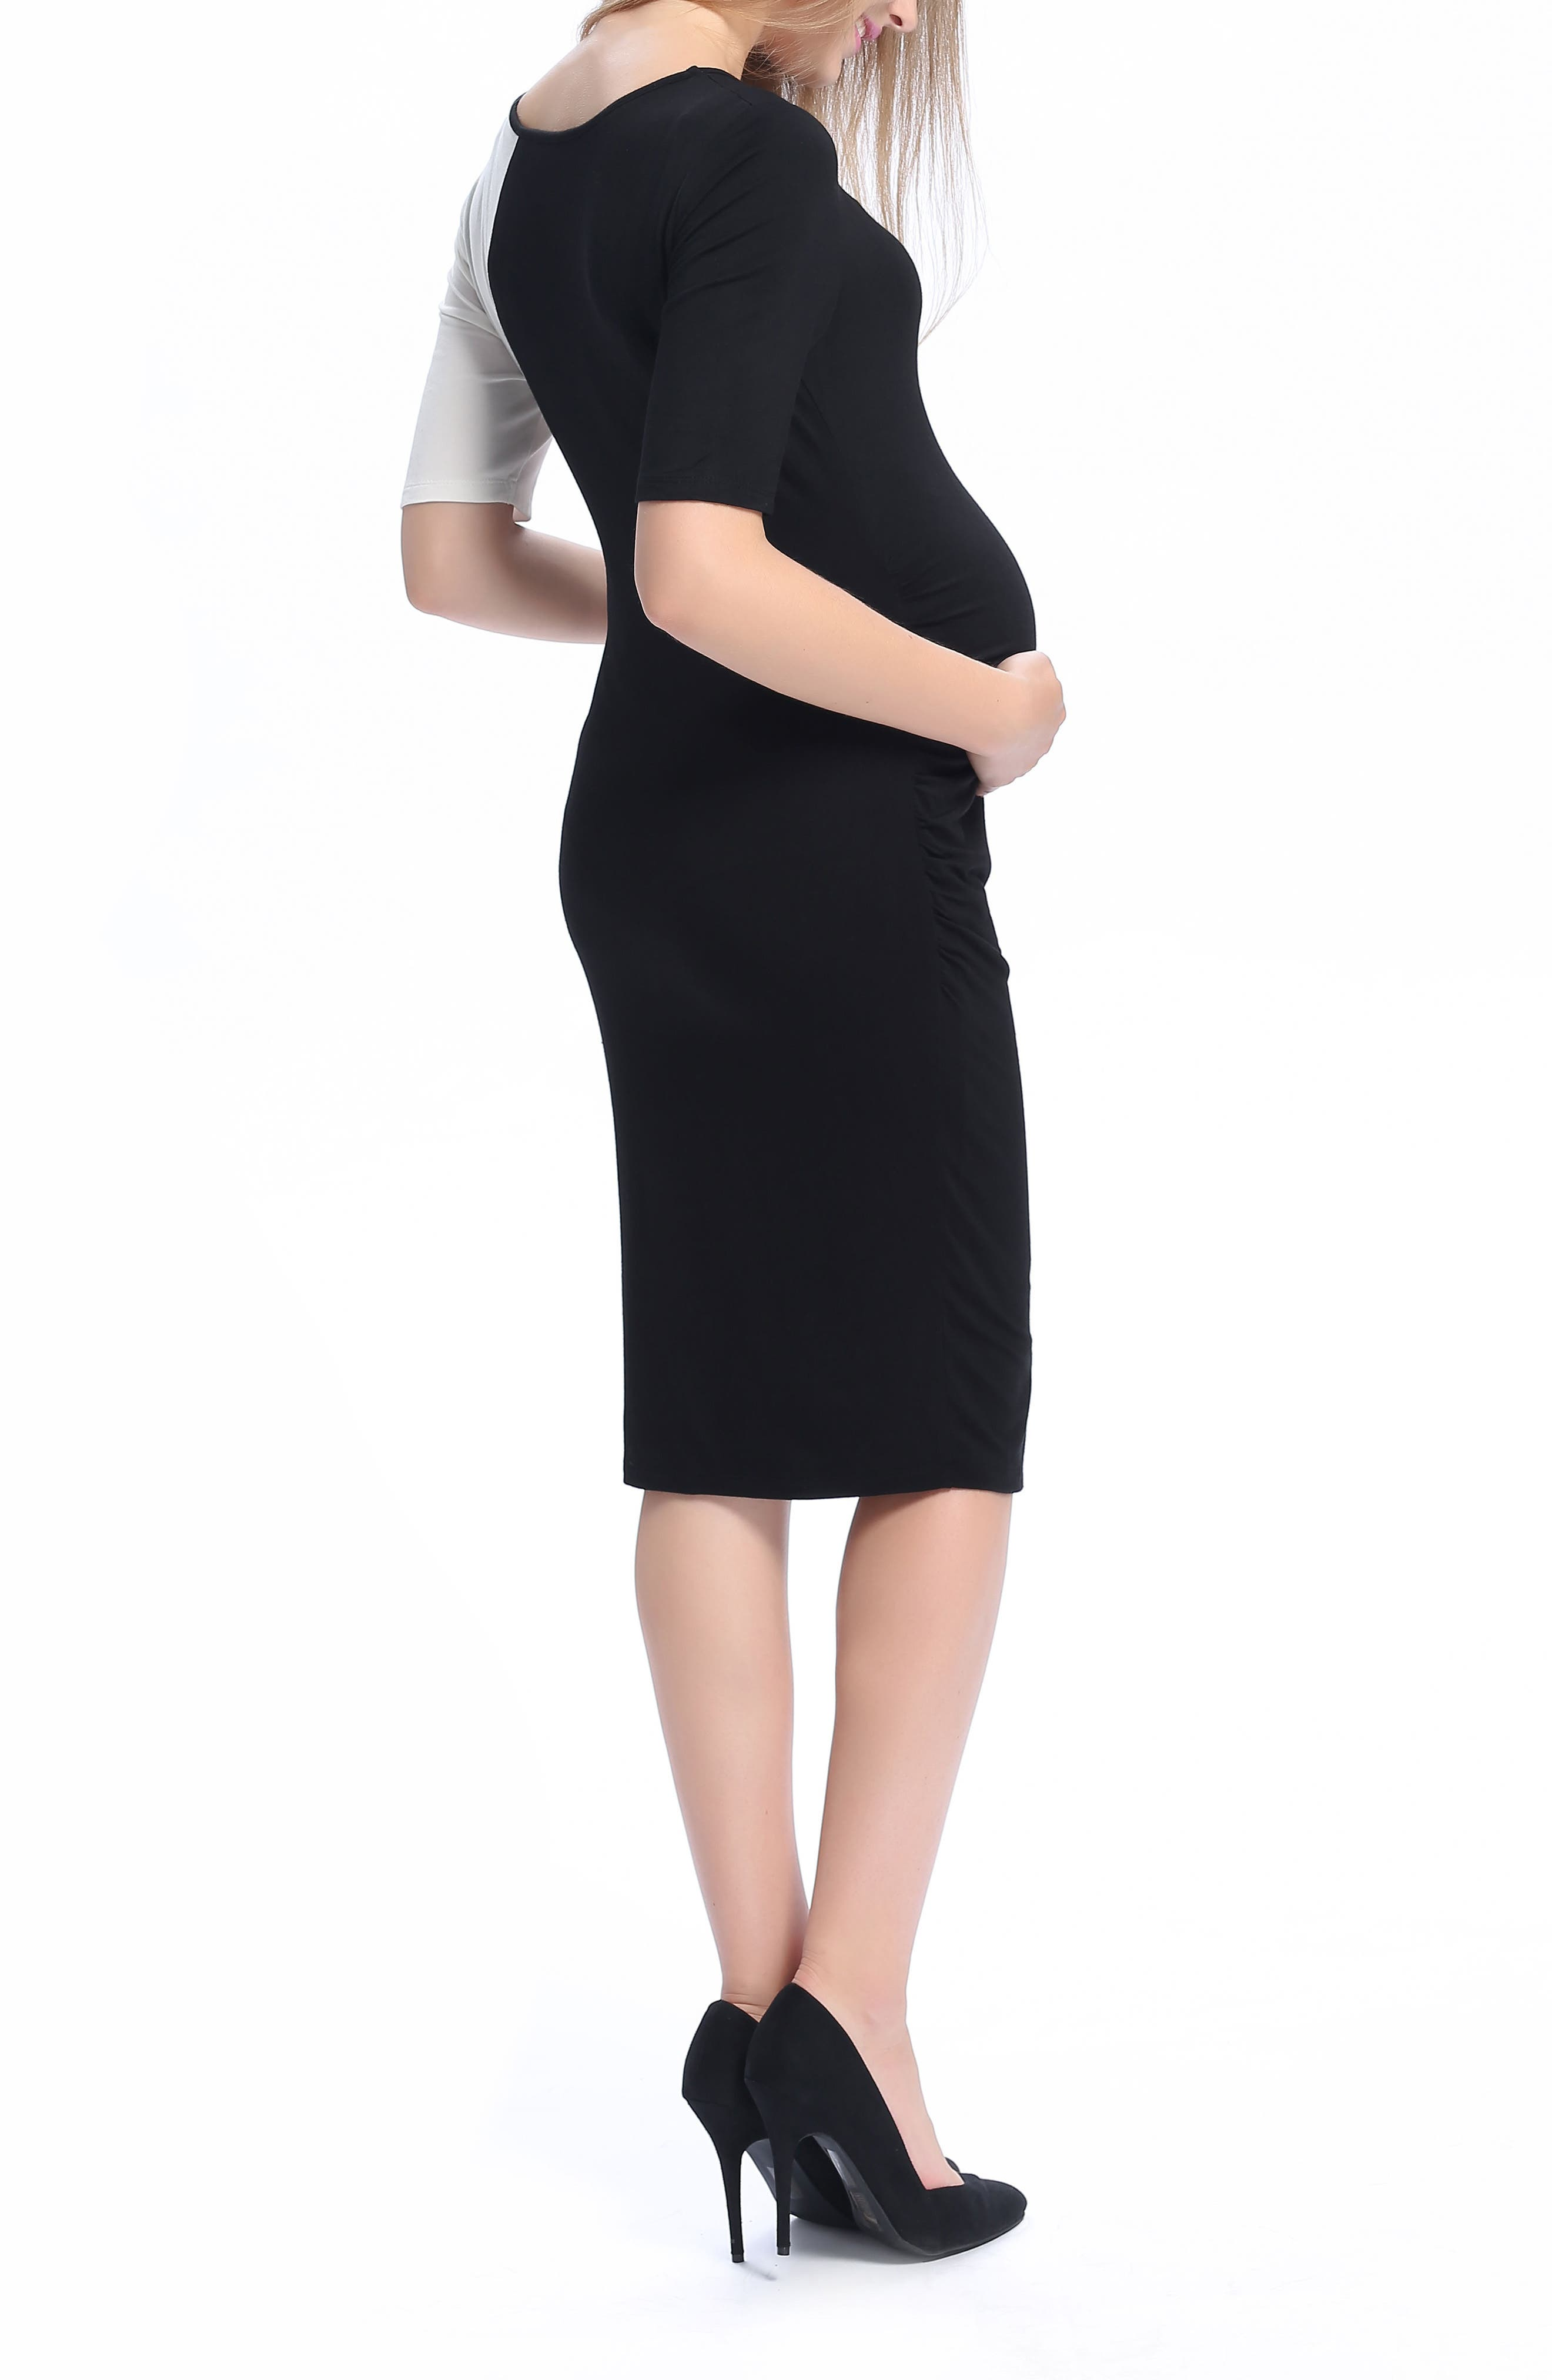 Daphne Colorblock Maternity Dress,                             Alternate thumbnail 10, color,                             017